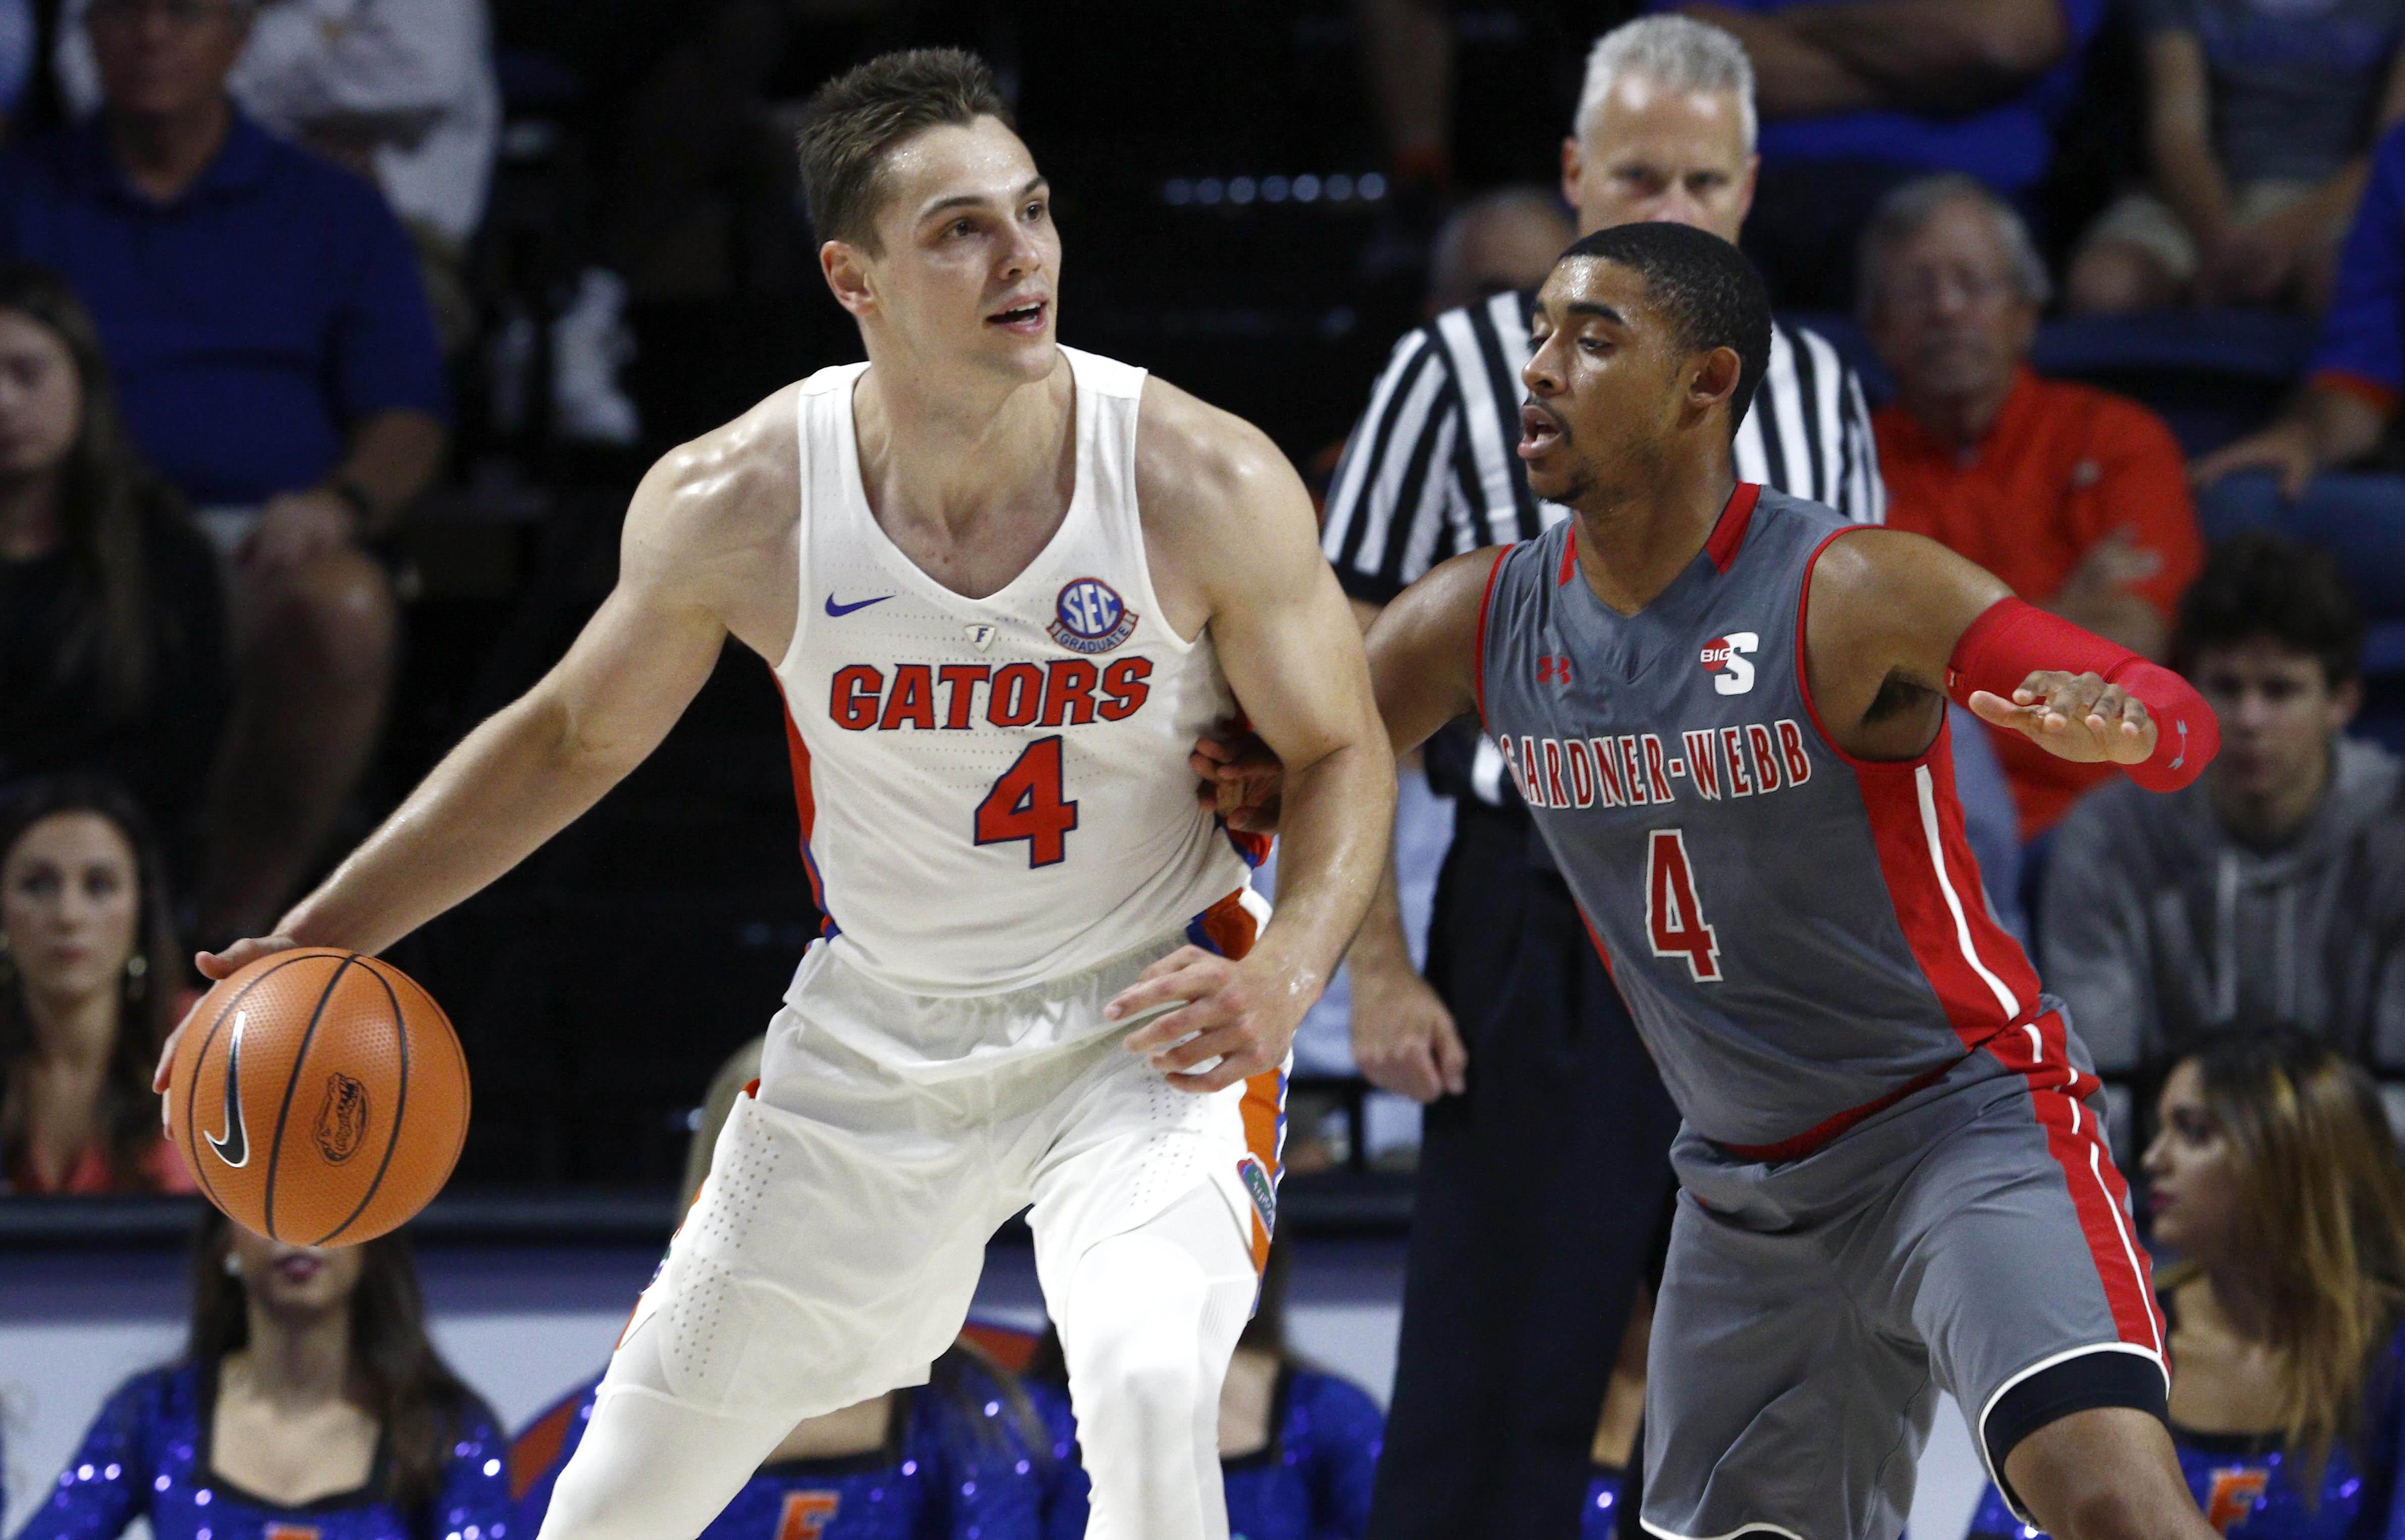 NCAA Basketball: Gardner-Webb at Florida